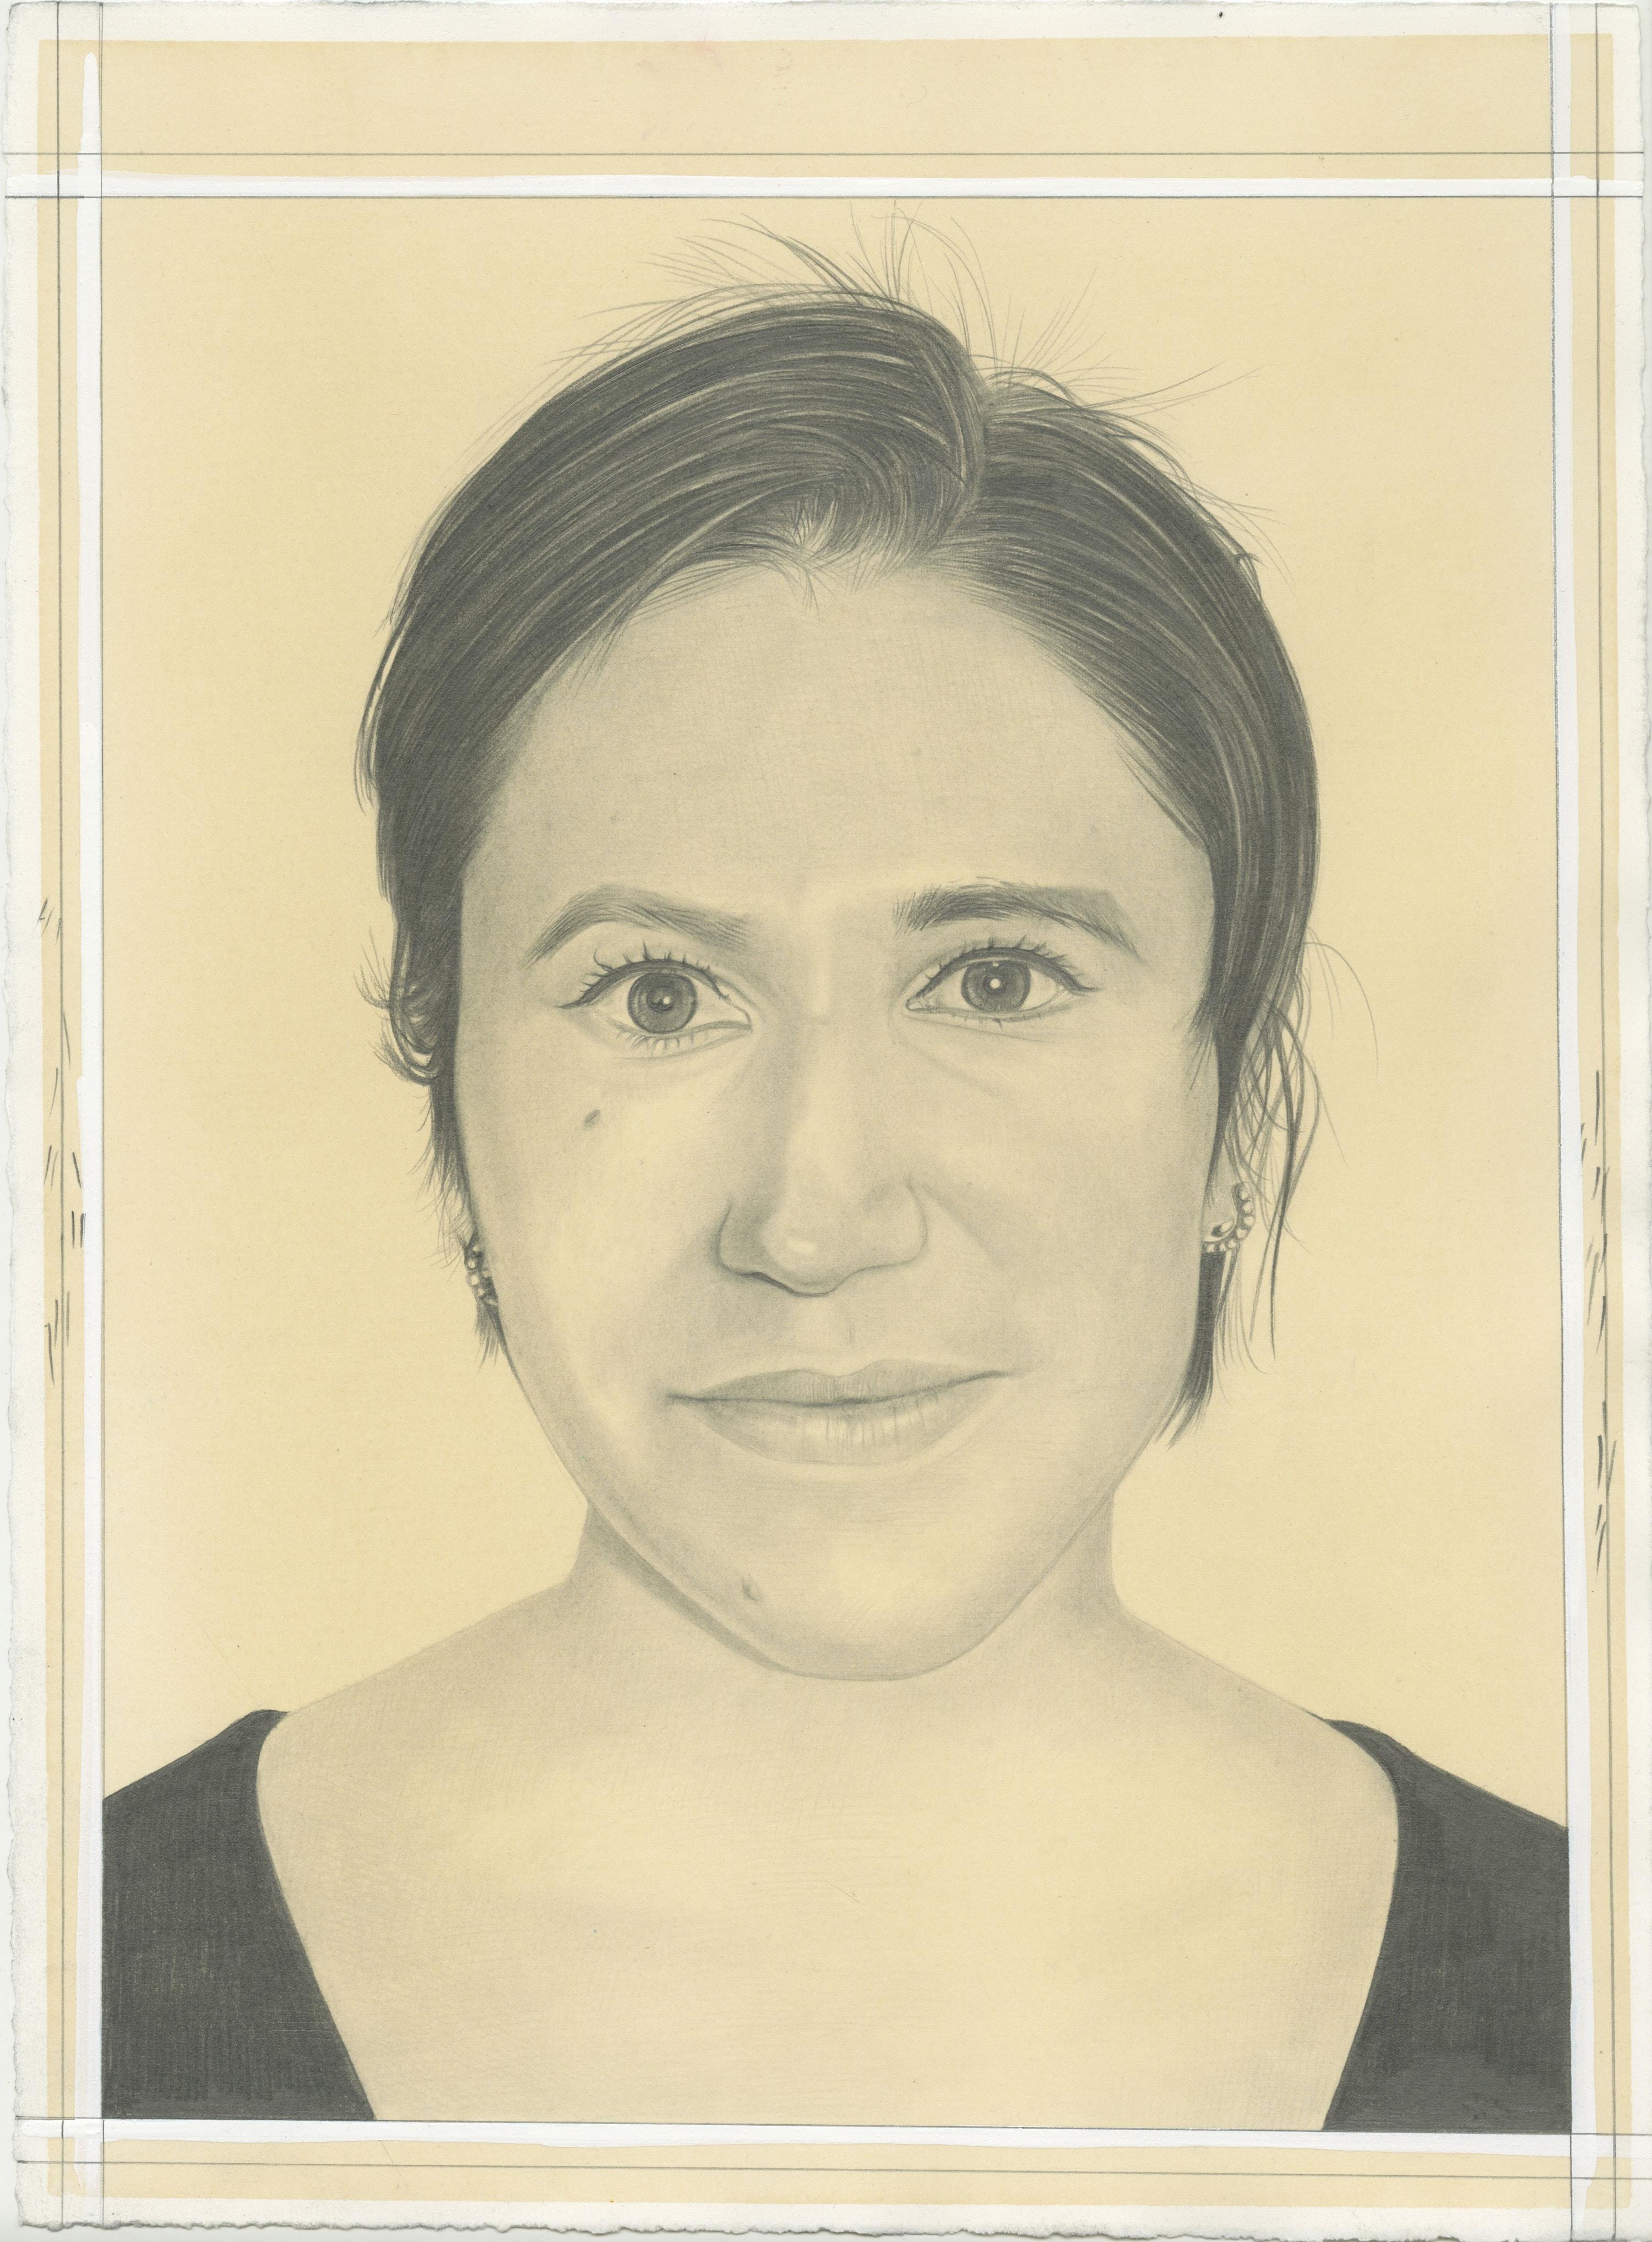 Portrait of Barbara De Vivi, pencil on paper by Phong Bui.